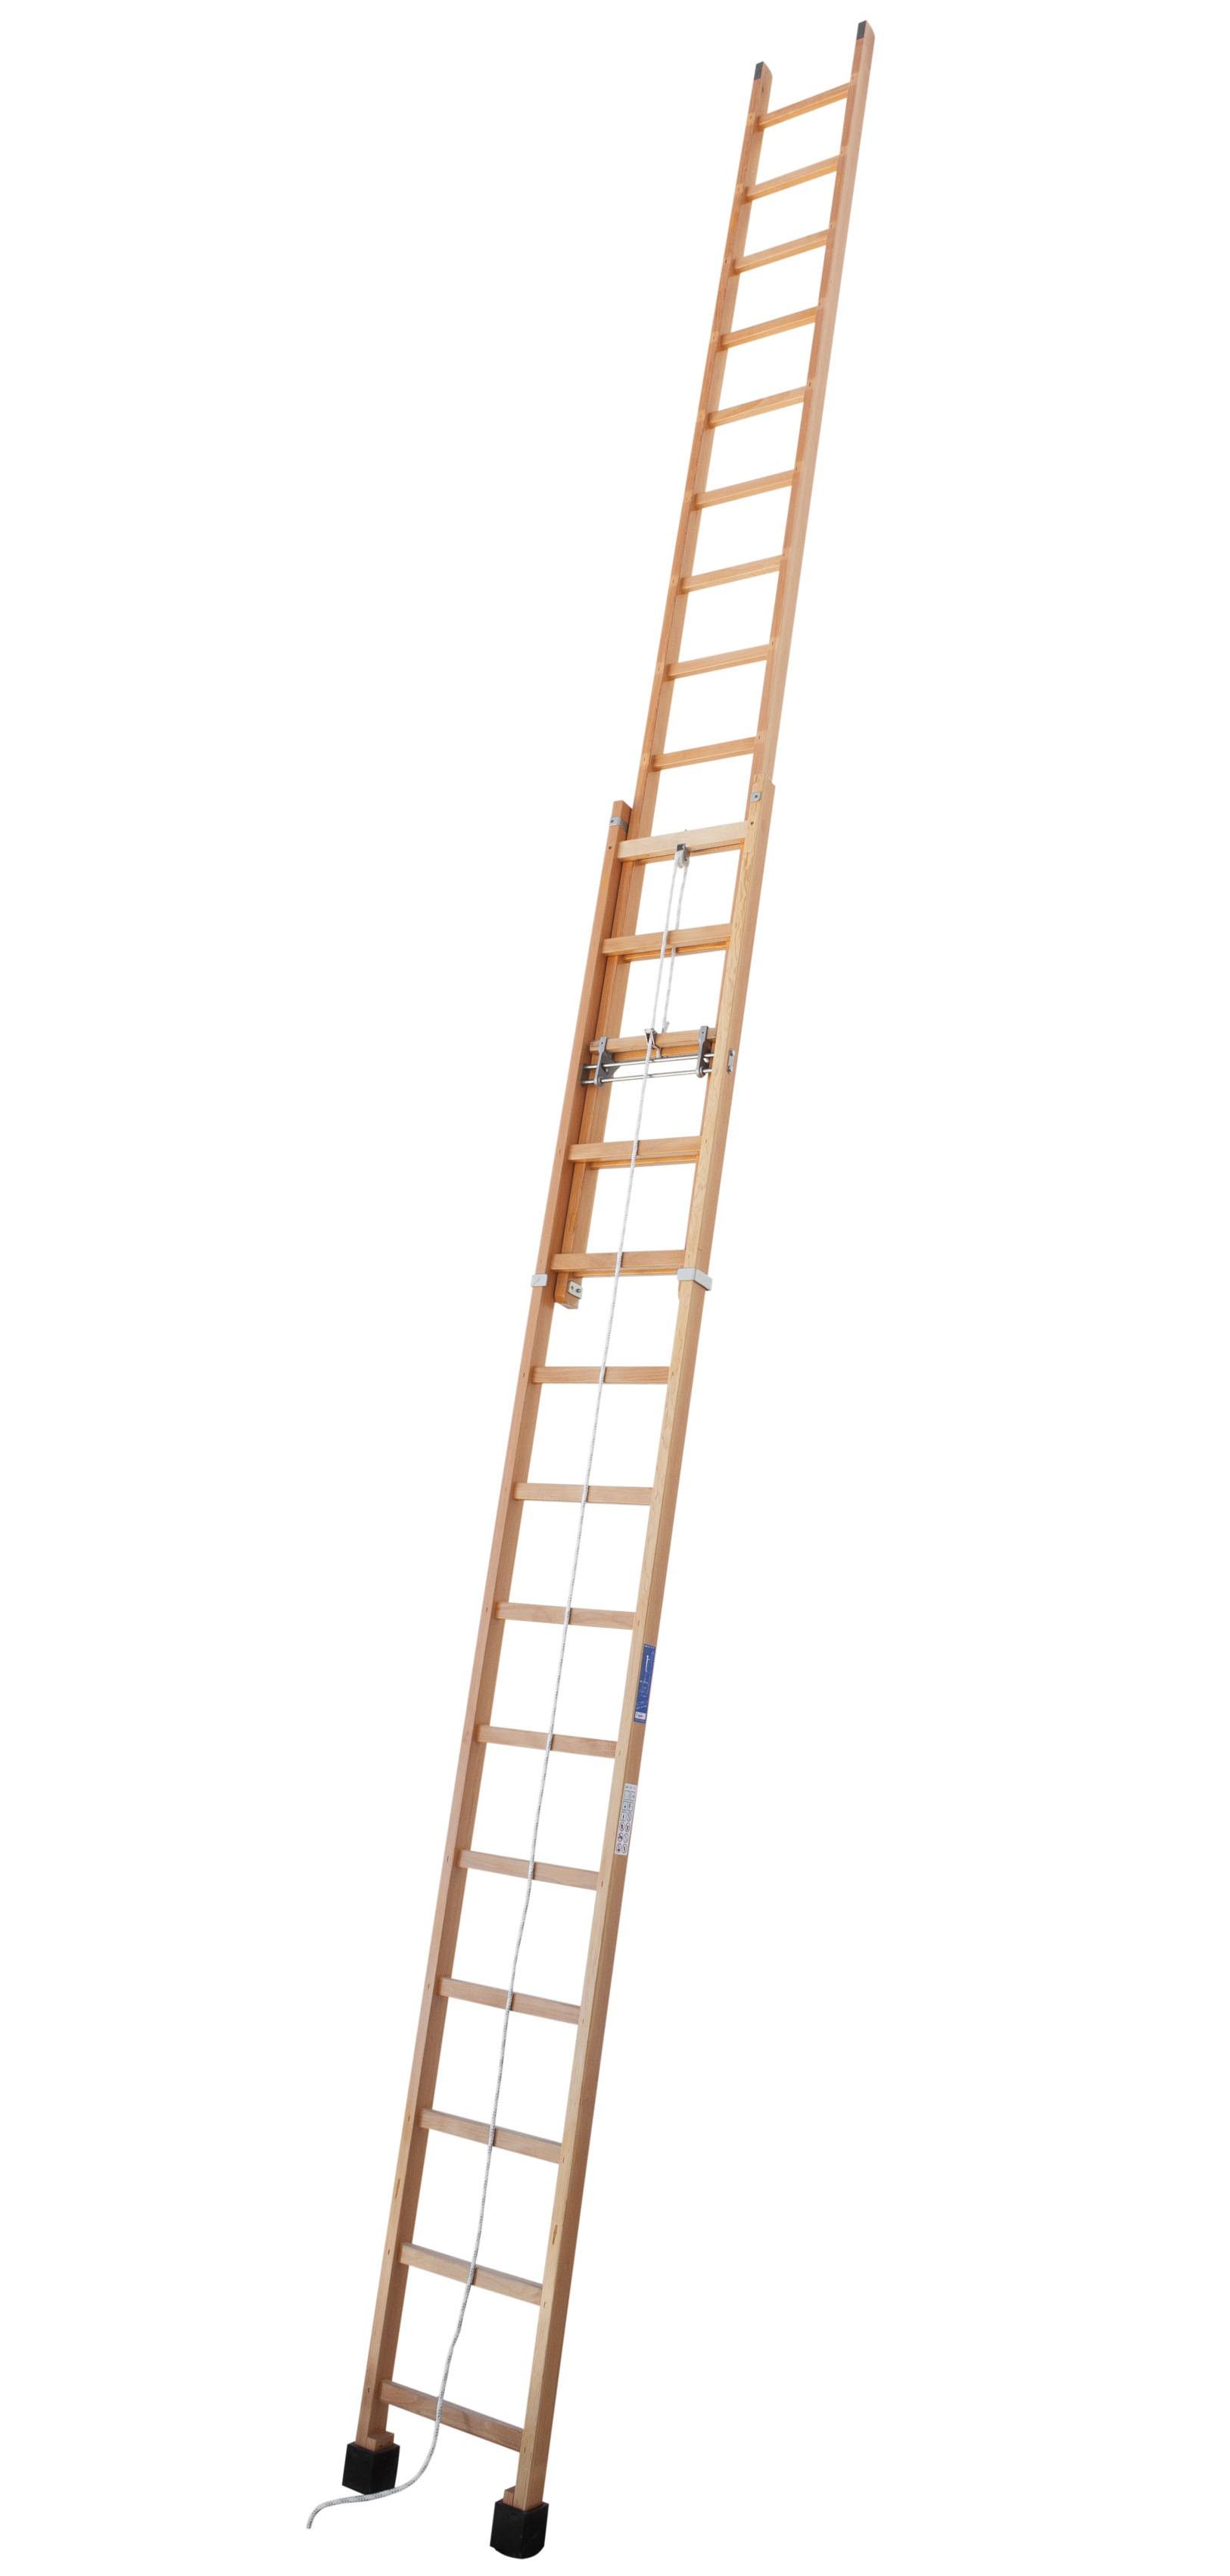 Escalera De Madera Extensible A Cuerda